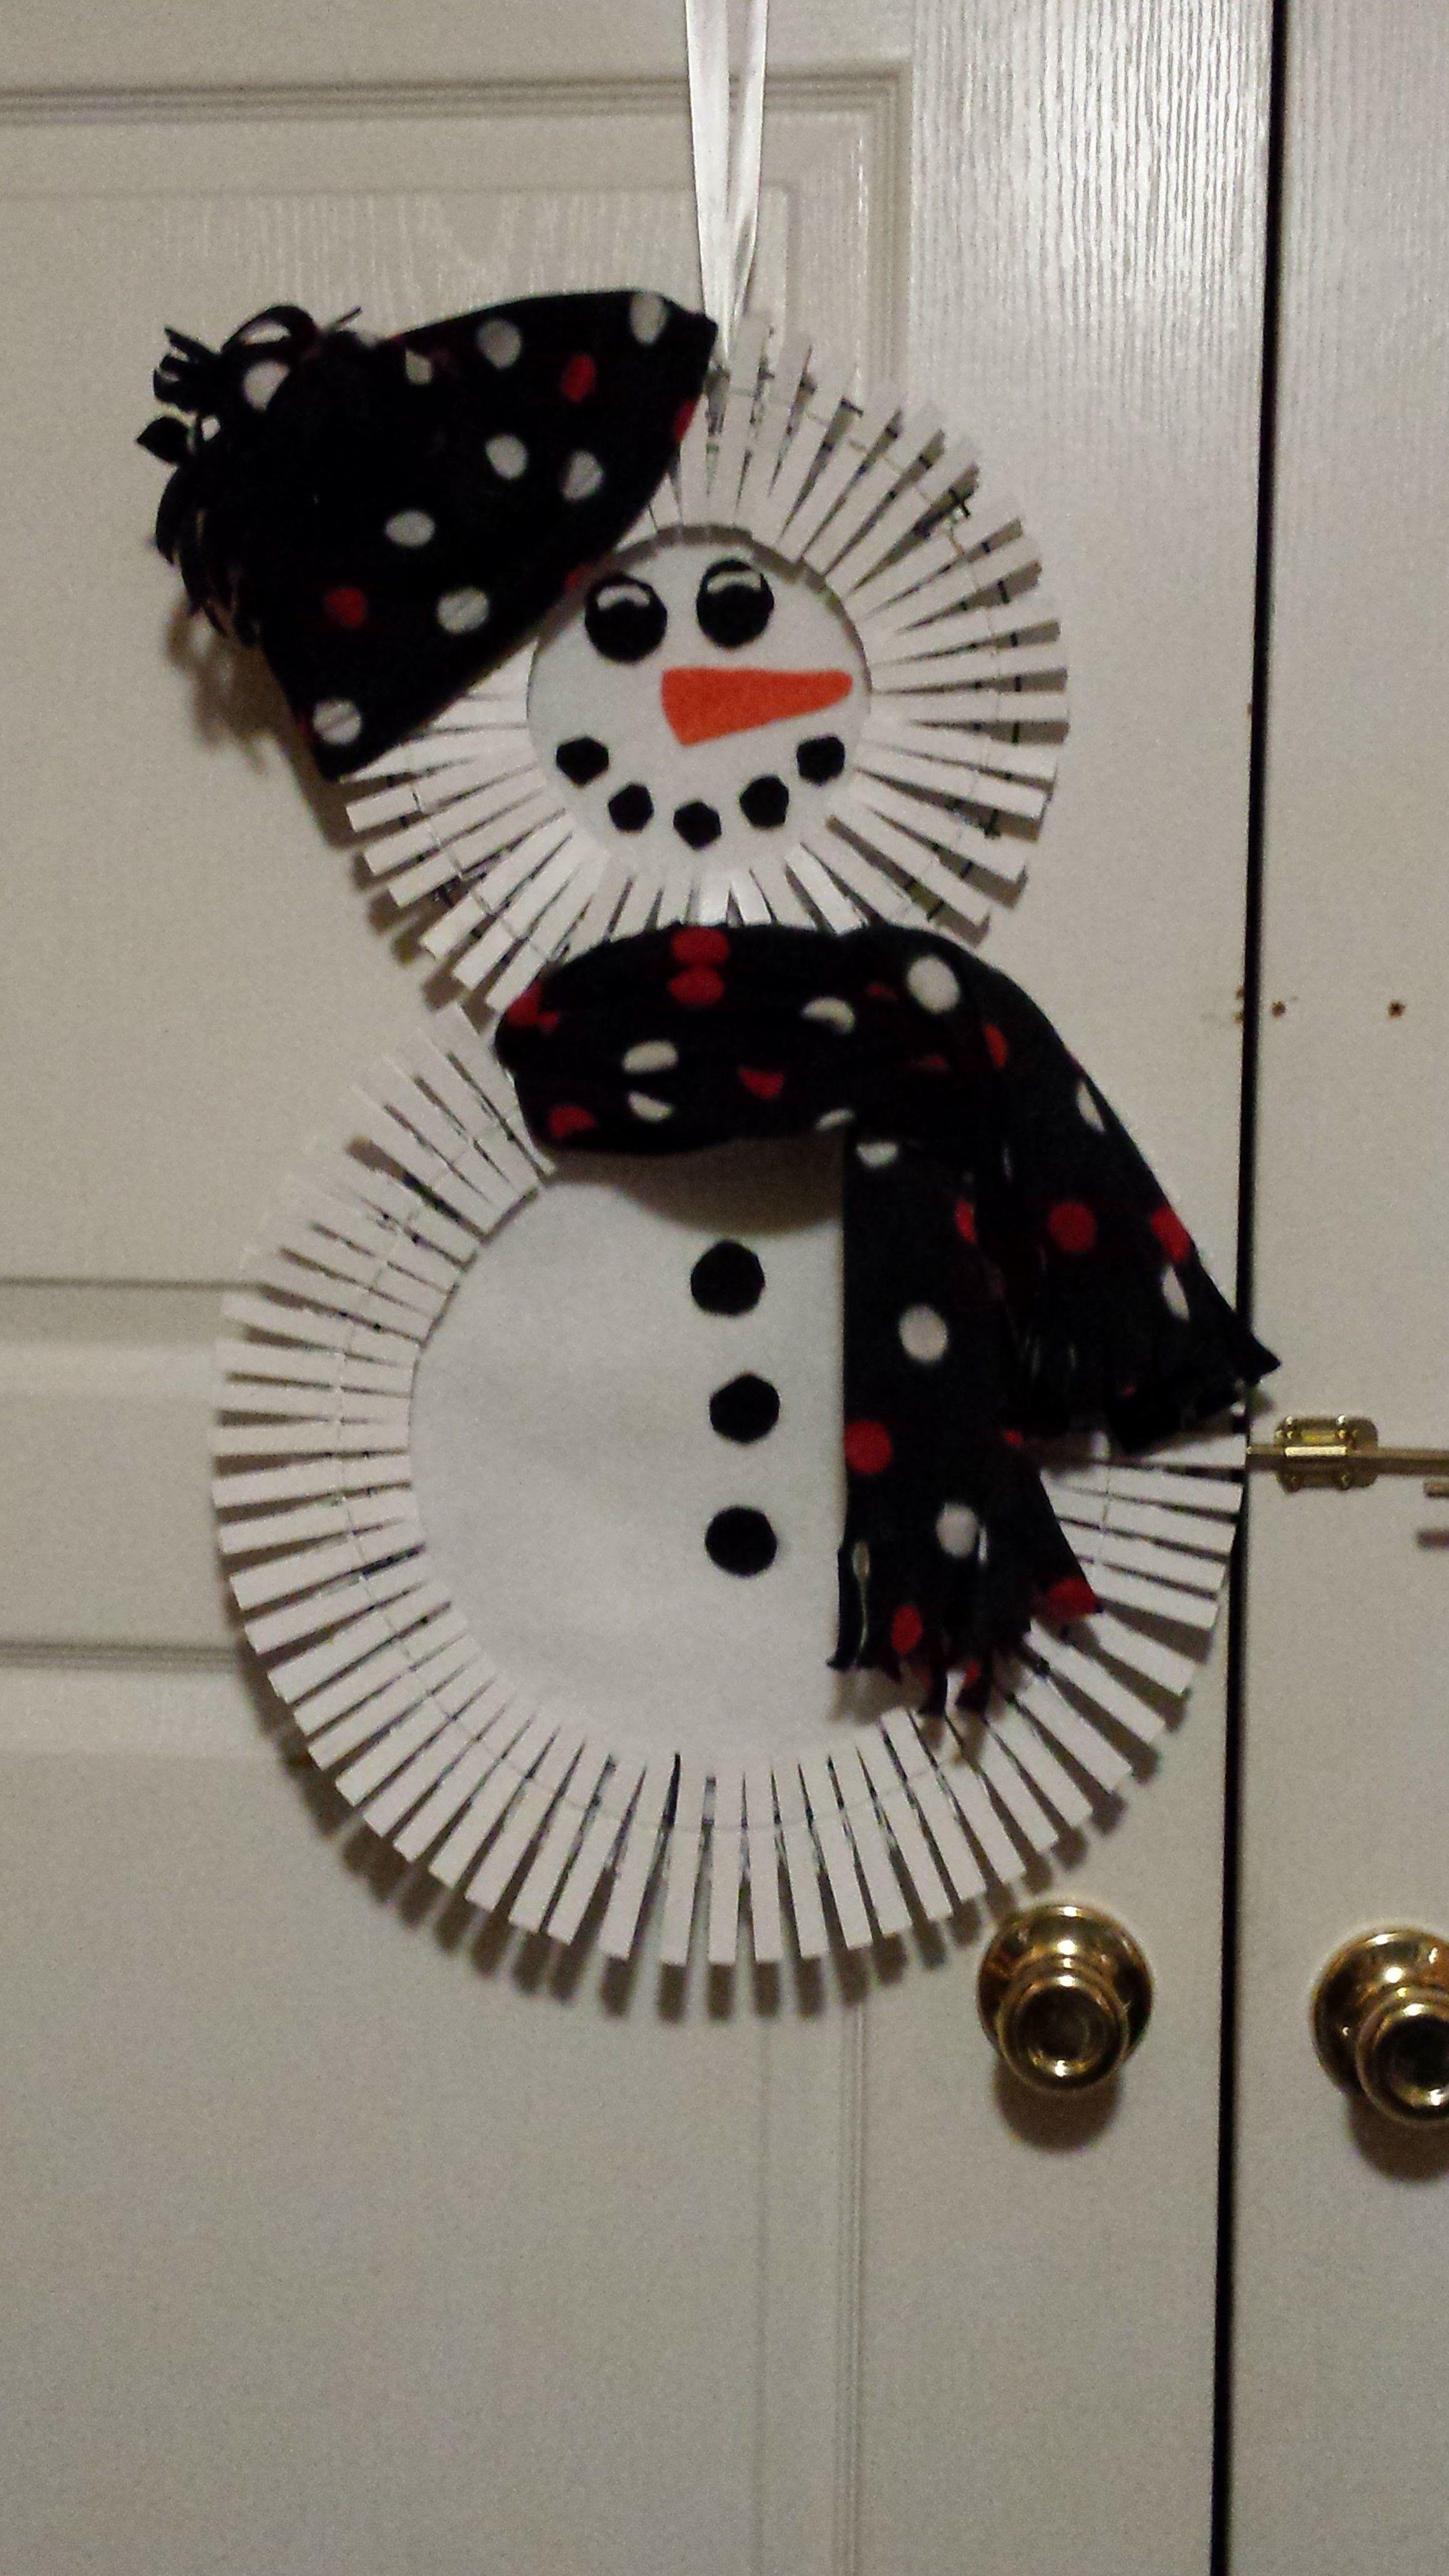 Fiber optic christmas snowman wreath decoration - Clothespin Wreath Snowman